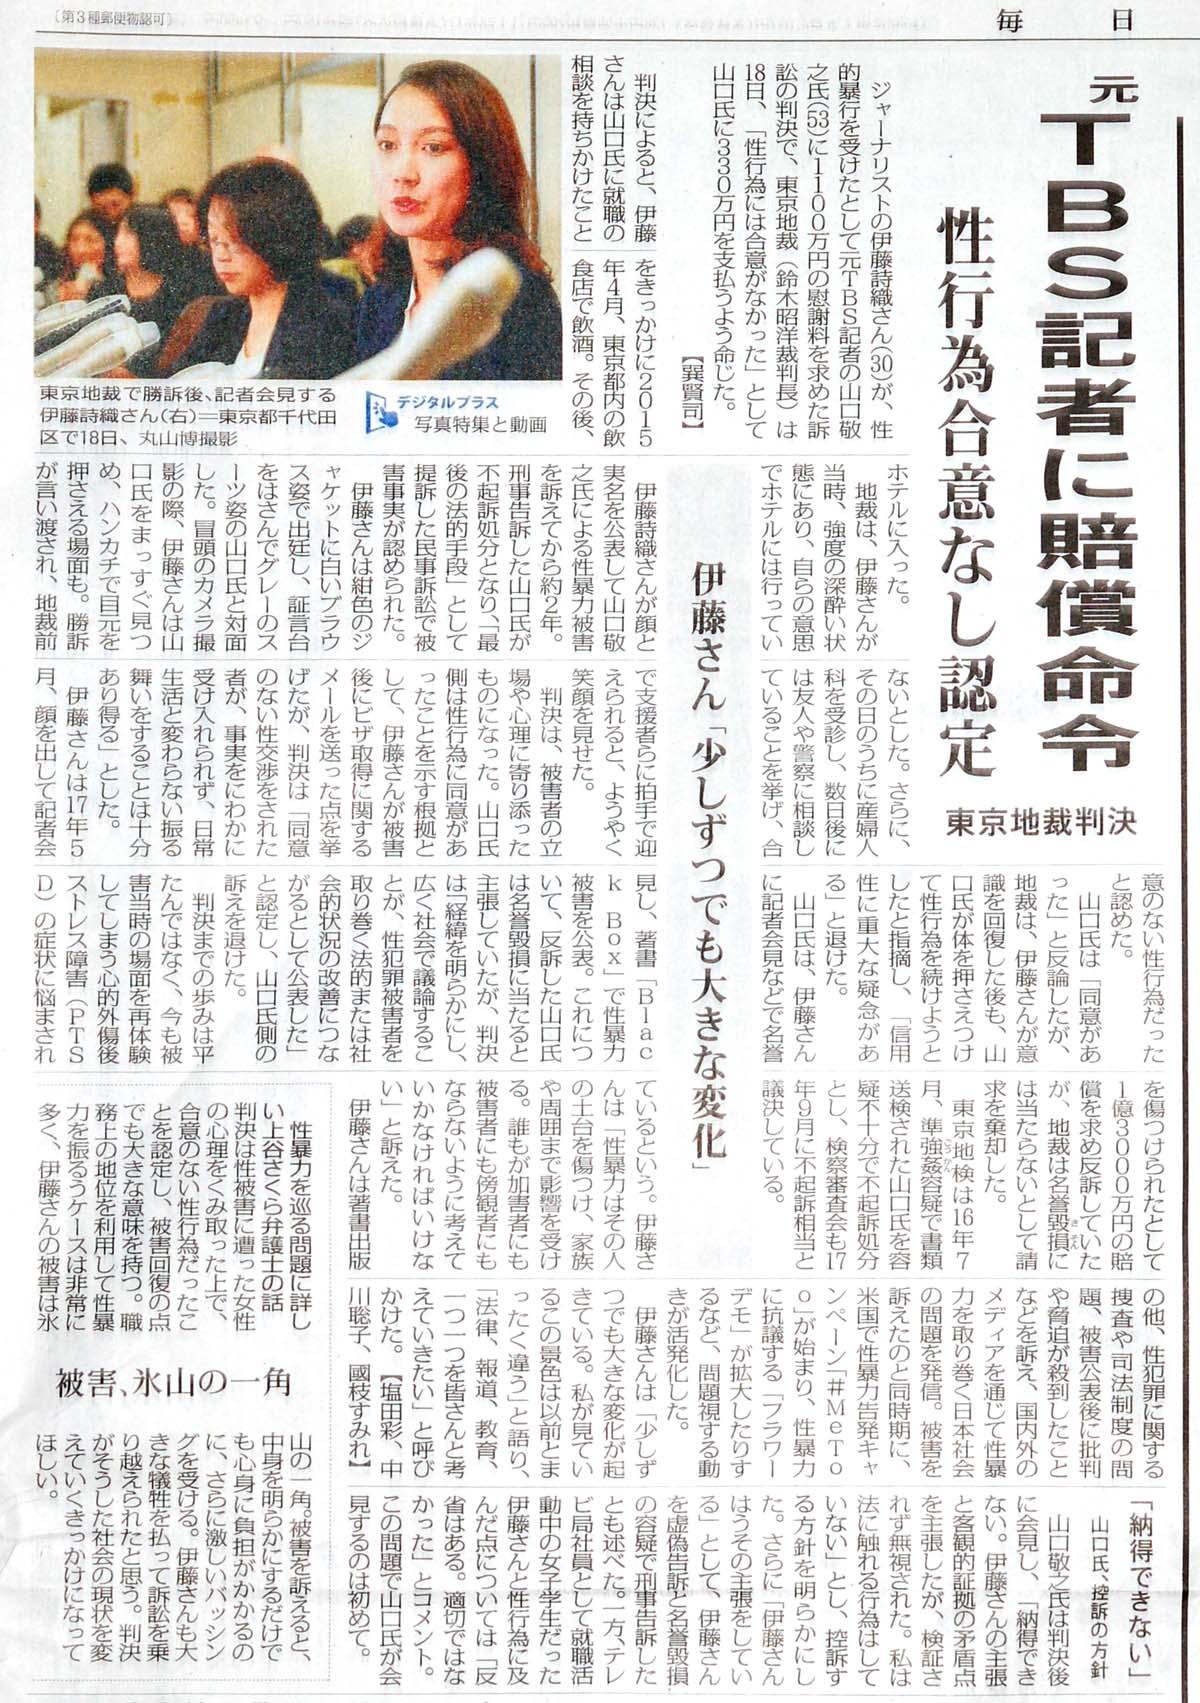 mainichi191219shiori1200w.jpg